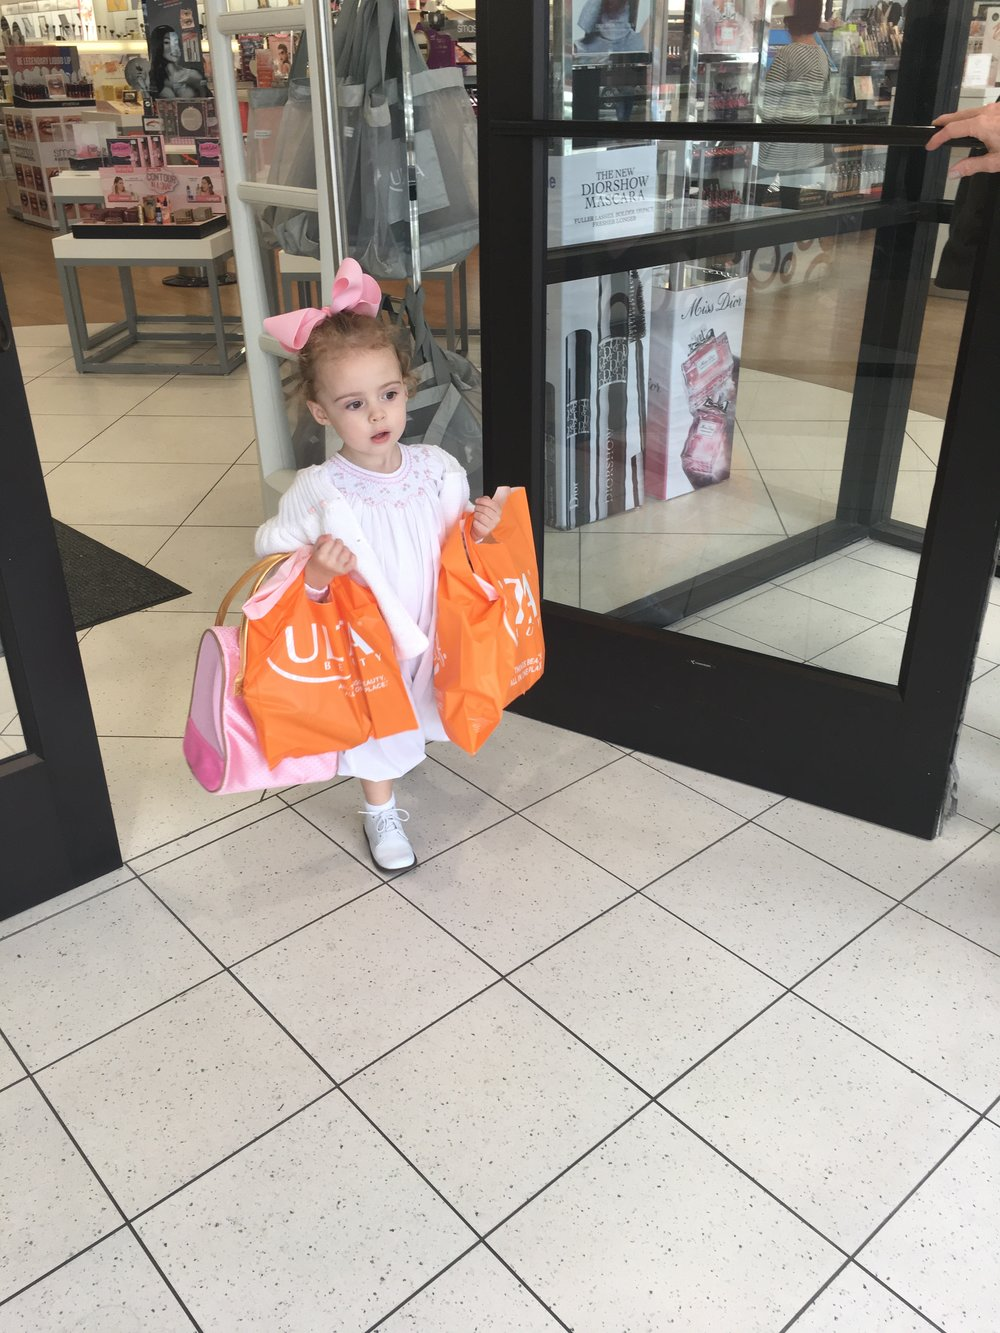 Shoppin' til she's droppin'!